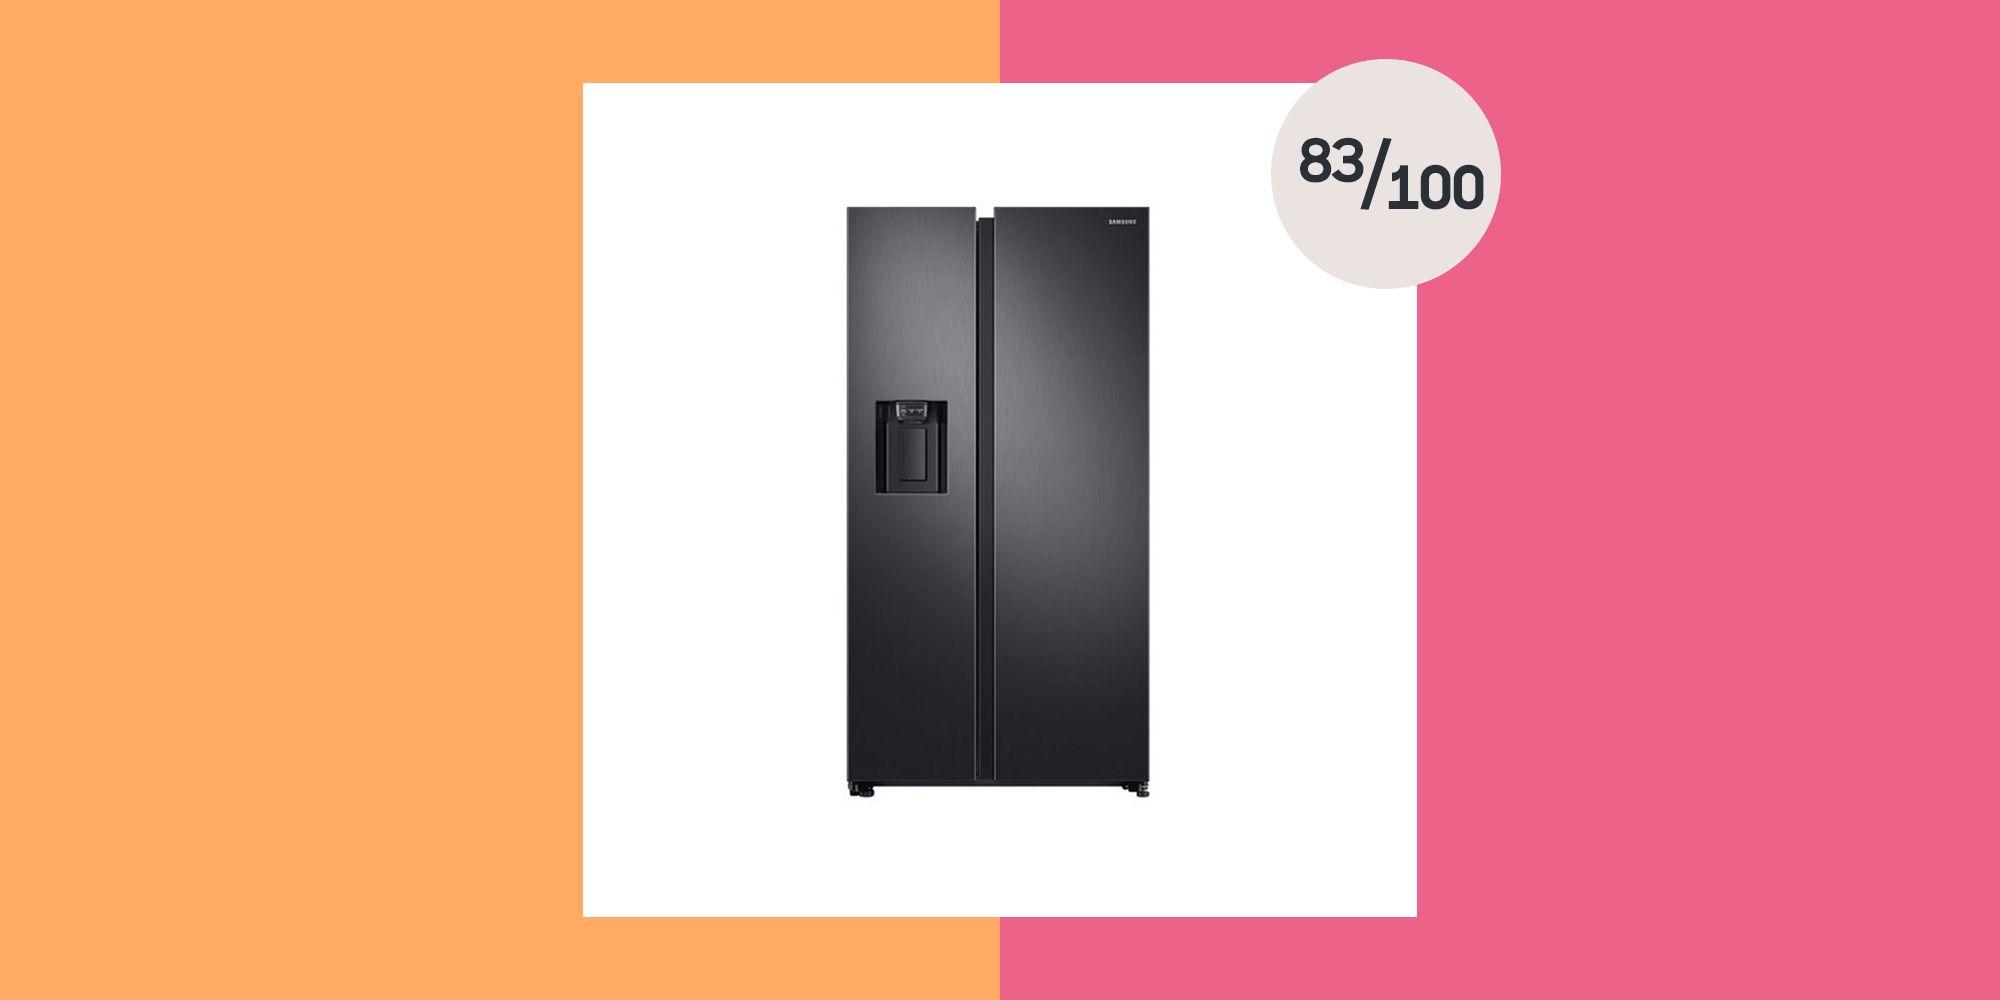 Samsung RS68N8230B1/EU Review